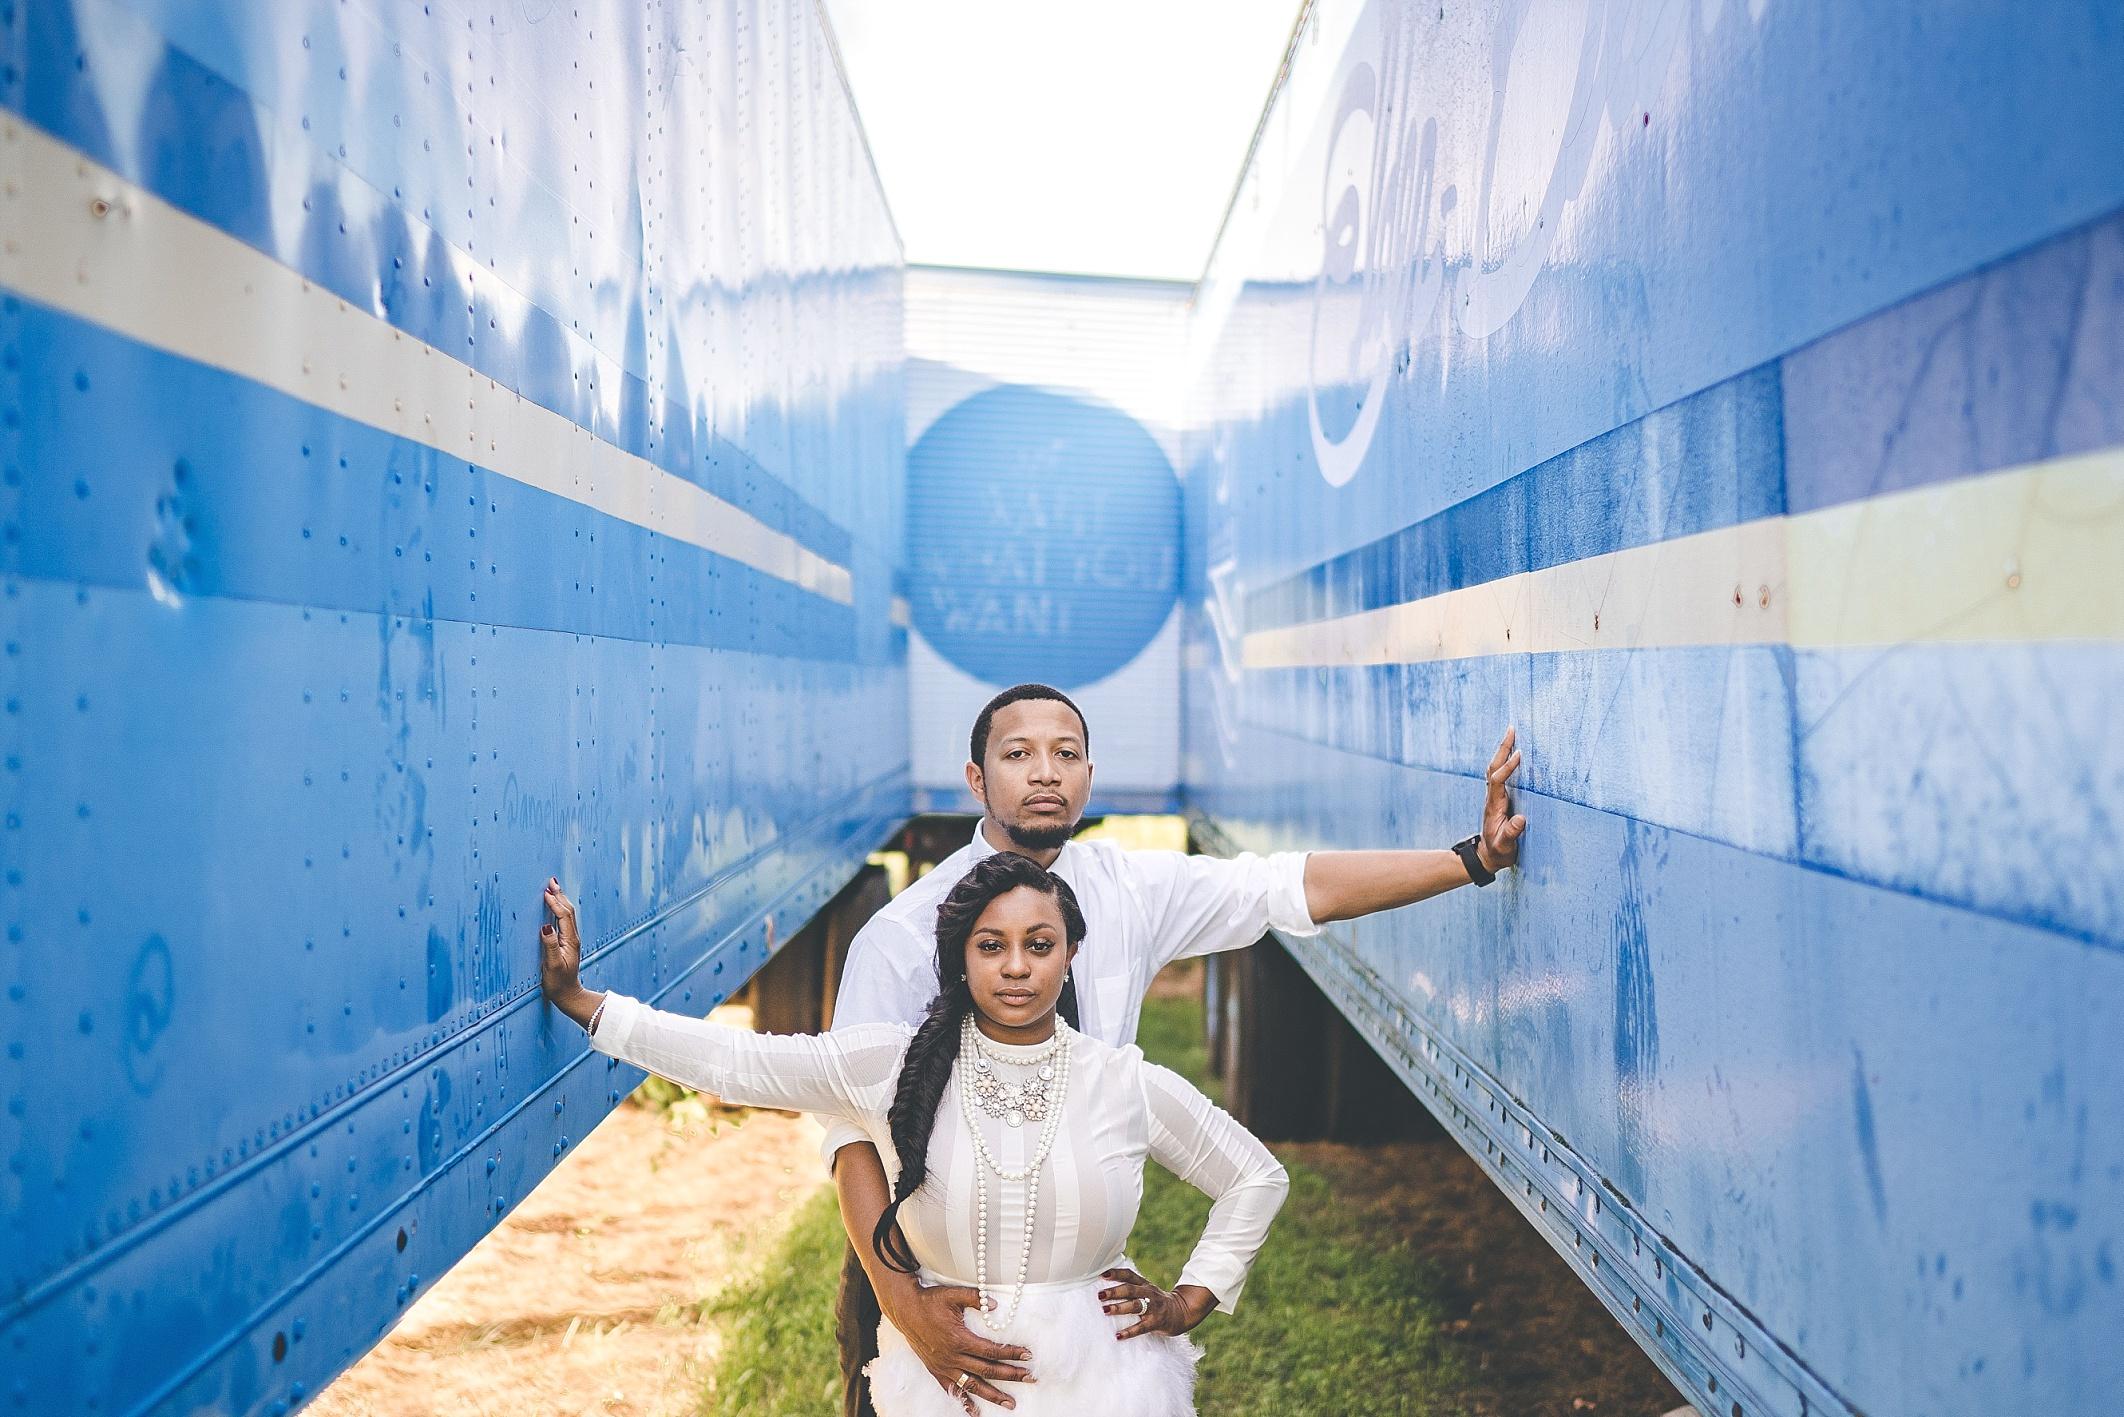 013-dayton-photographer-engagement-urban.jpg